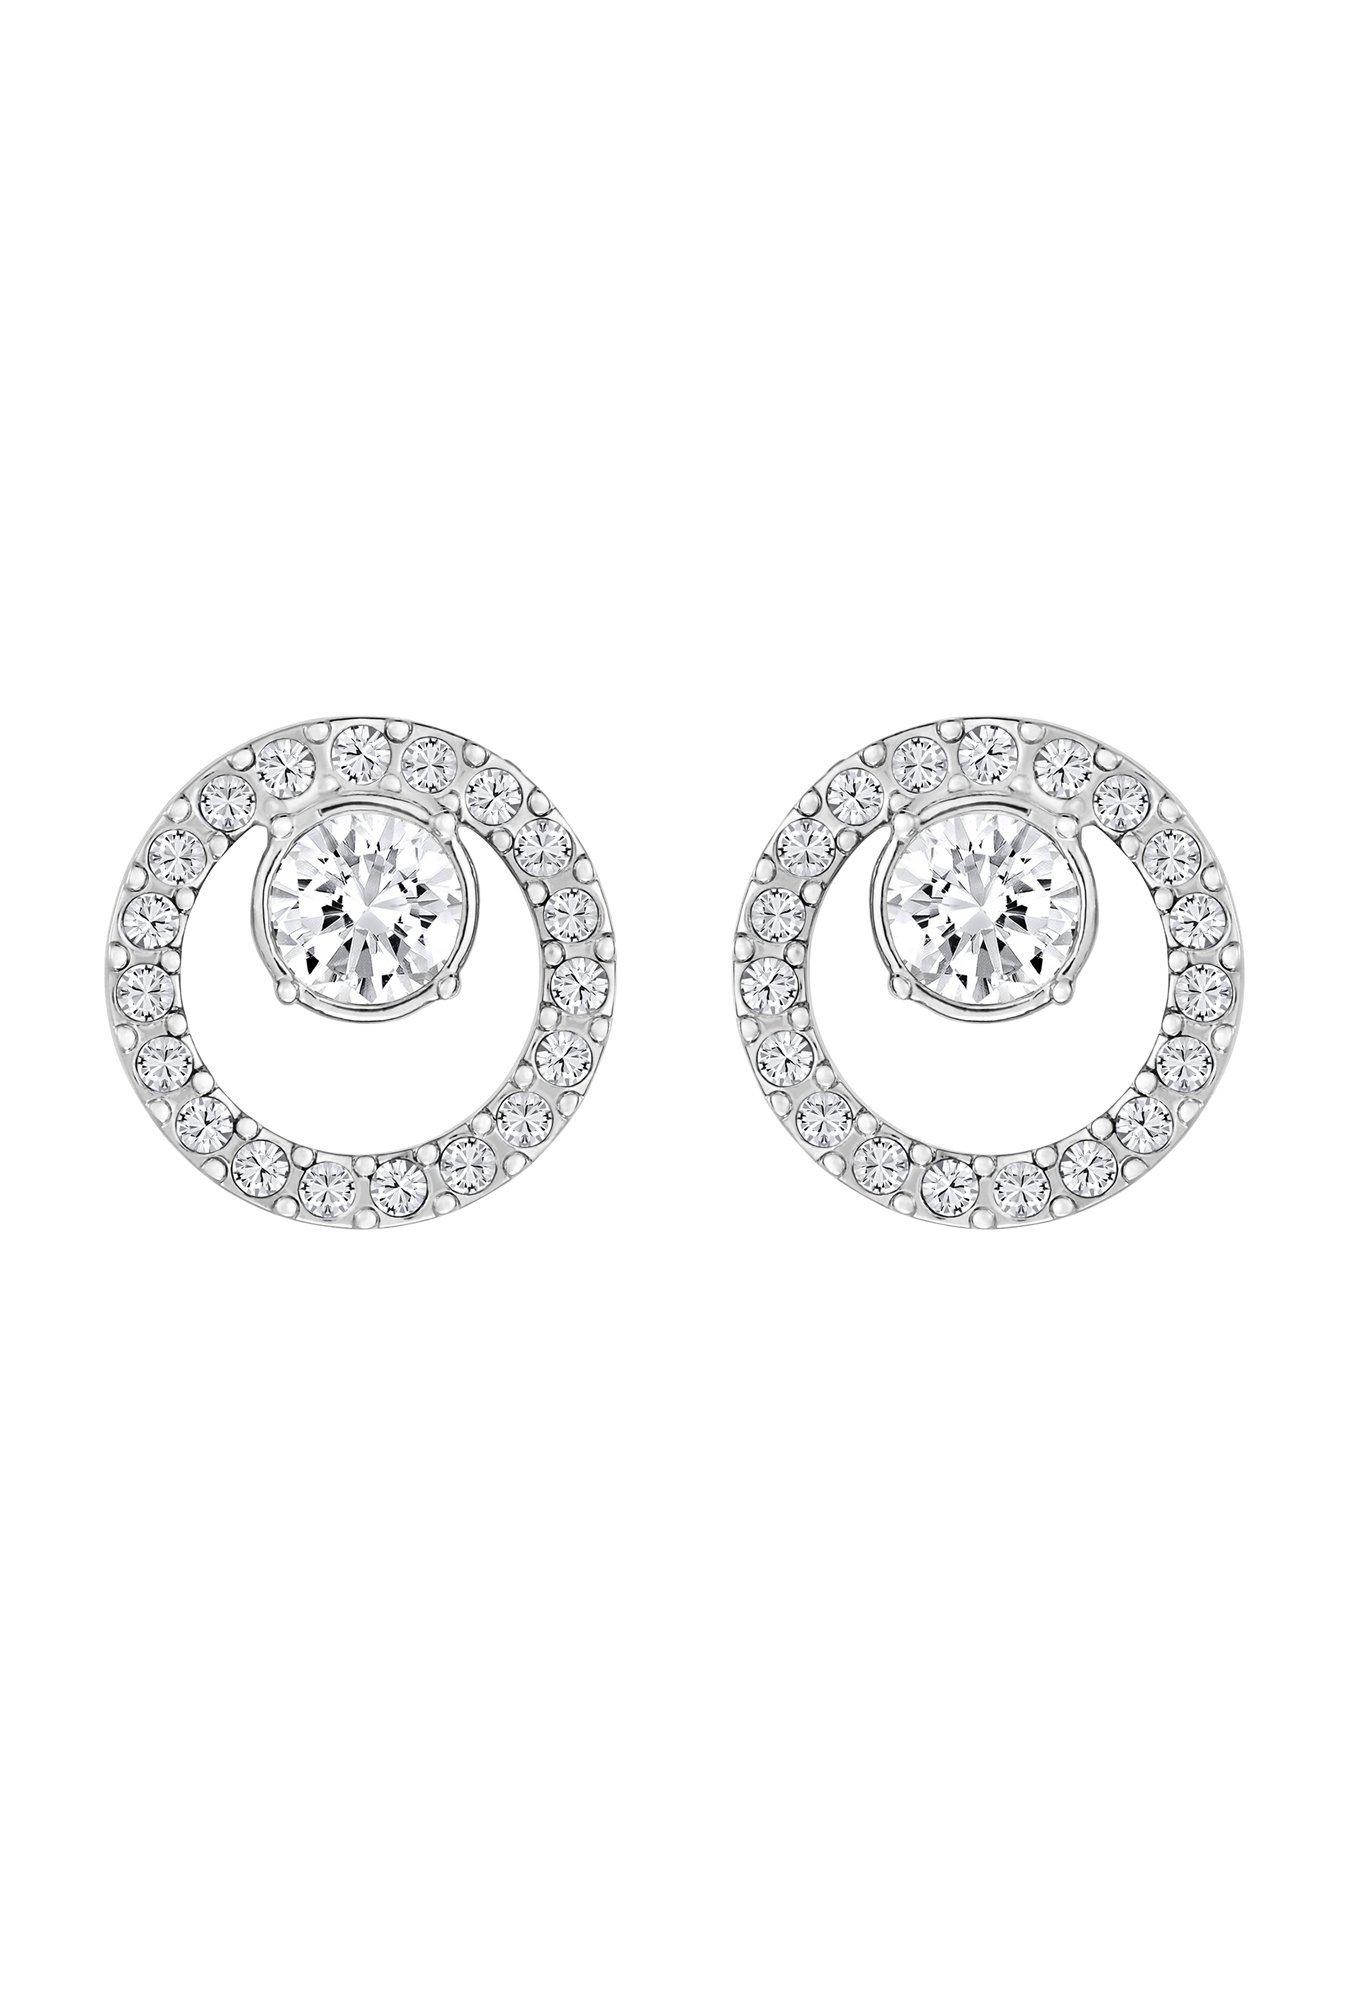 63c7e8972 Buy Swarovski Creativity Circle Silver Stud Earrings Online At Best Price @  Tata CLiQ